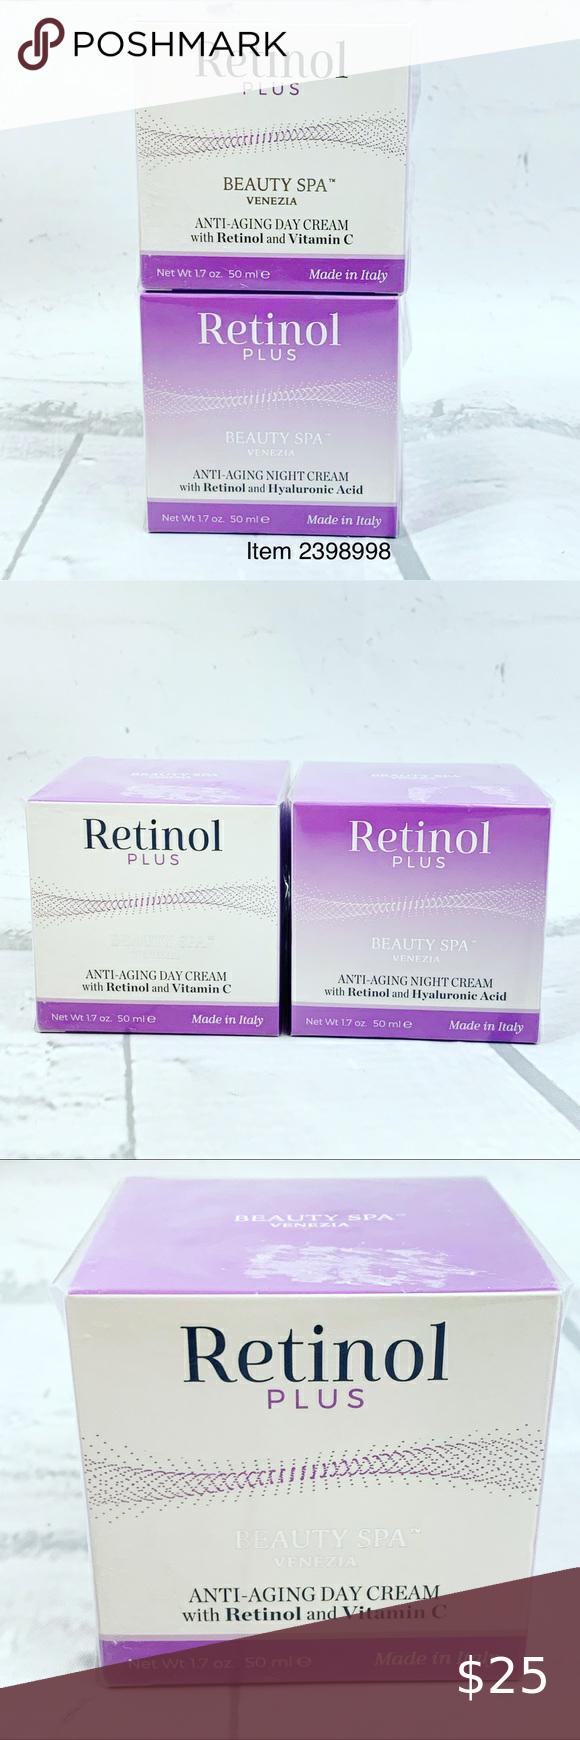 Retinol Plus Beauty Anti Aging Day And Night Cream In 2021 Anti Aging Beauty Night Creams Firming Moisturizer